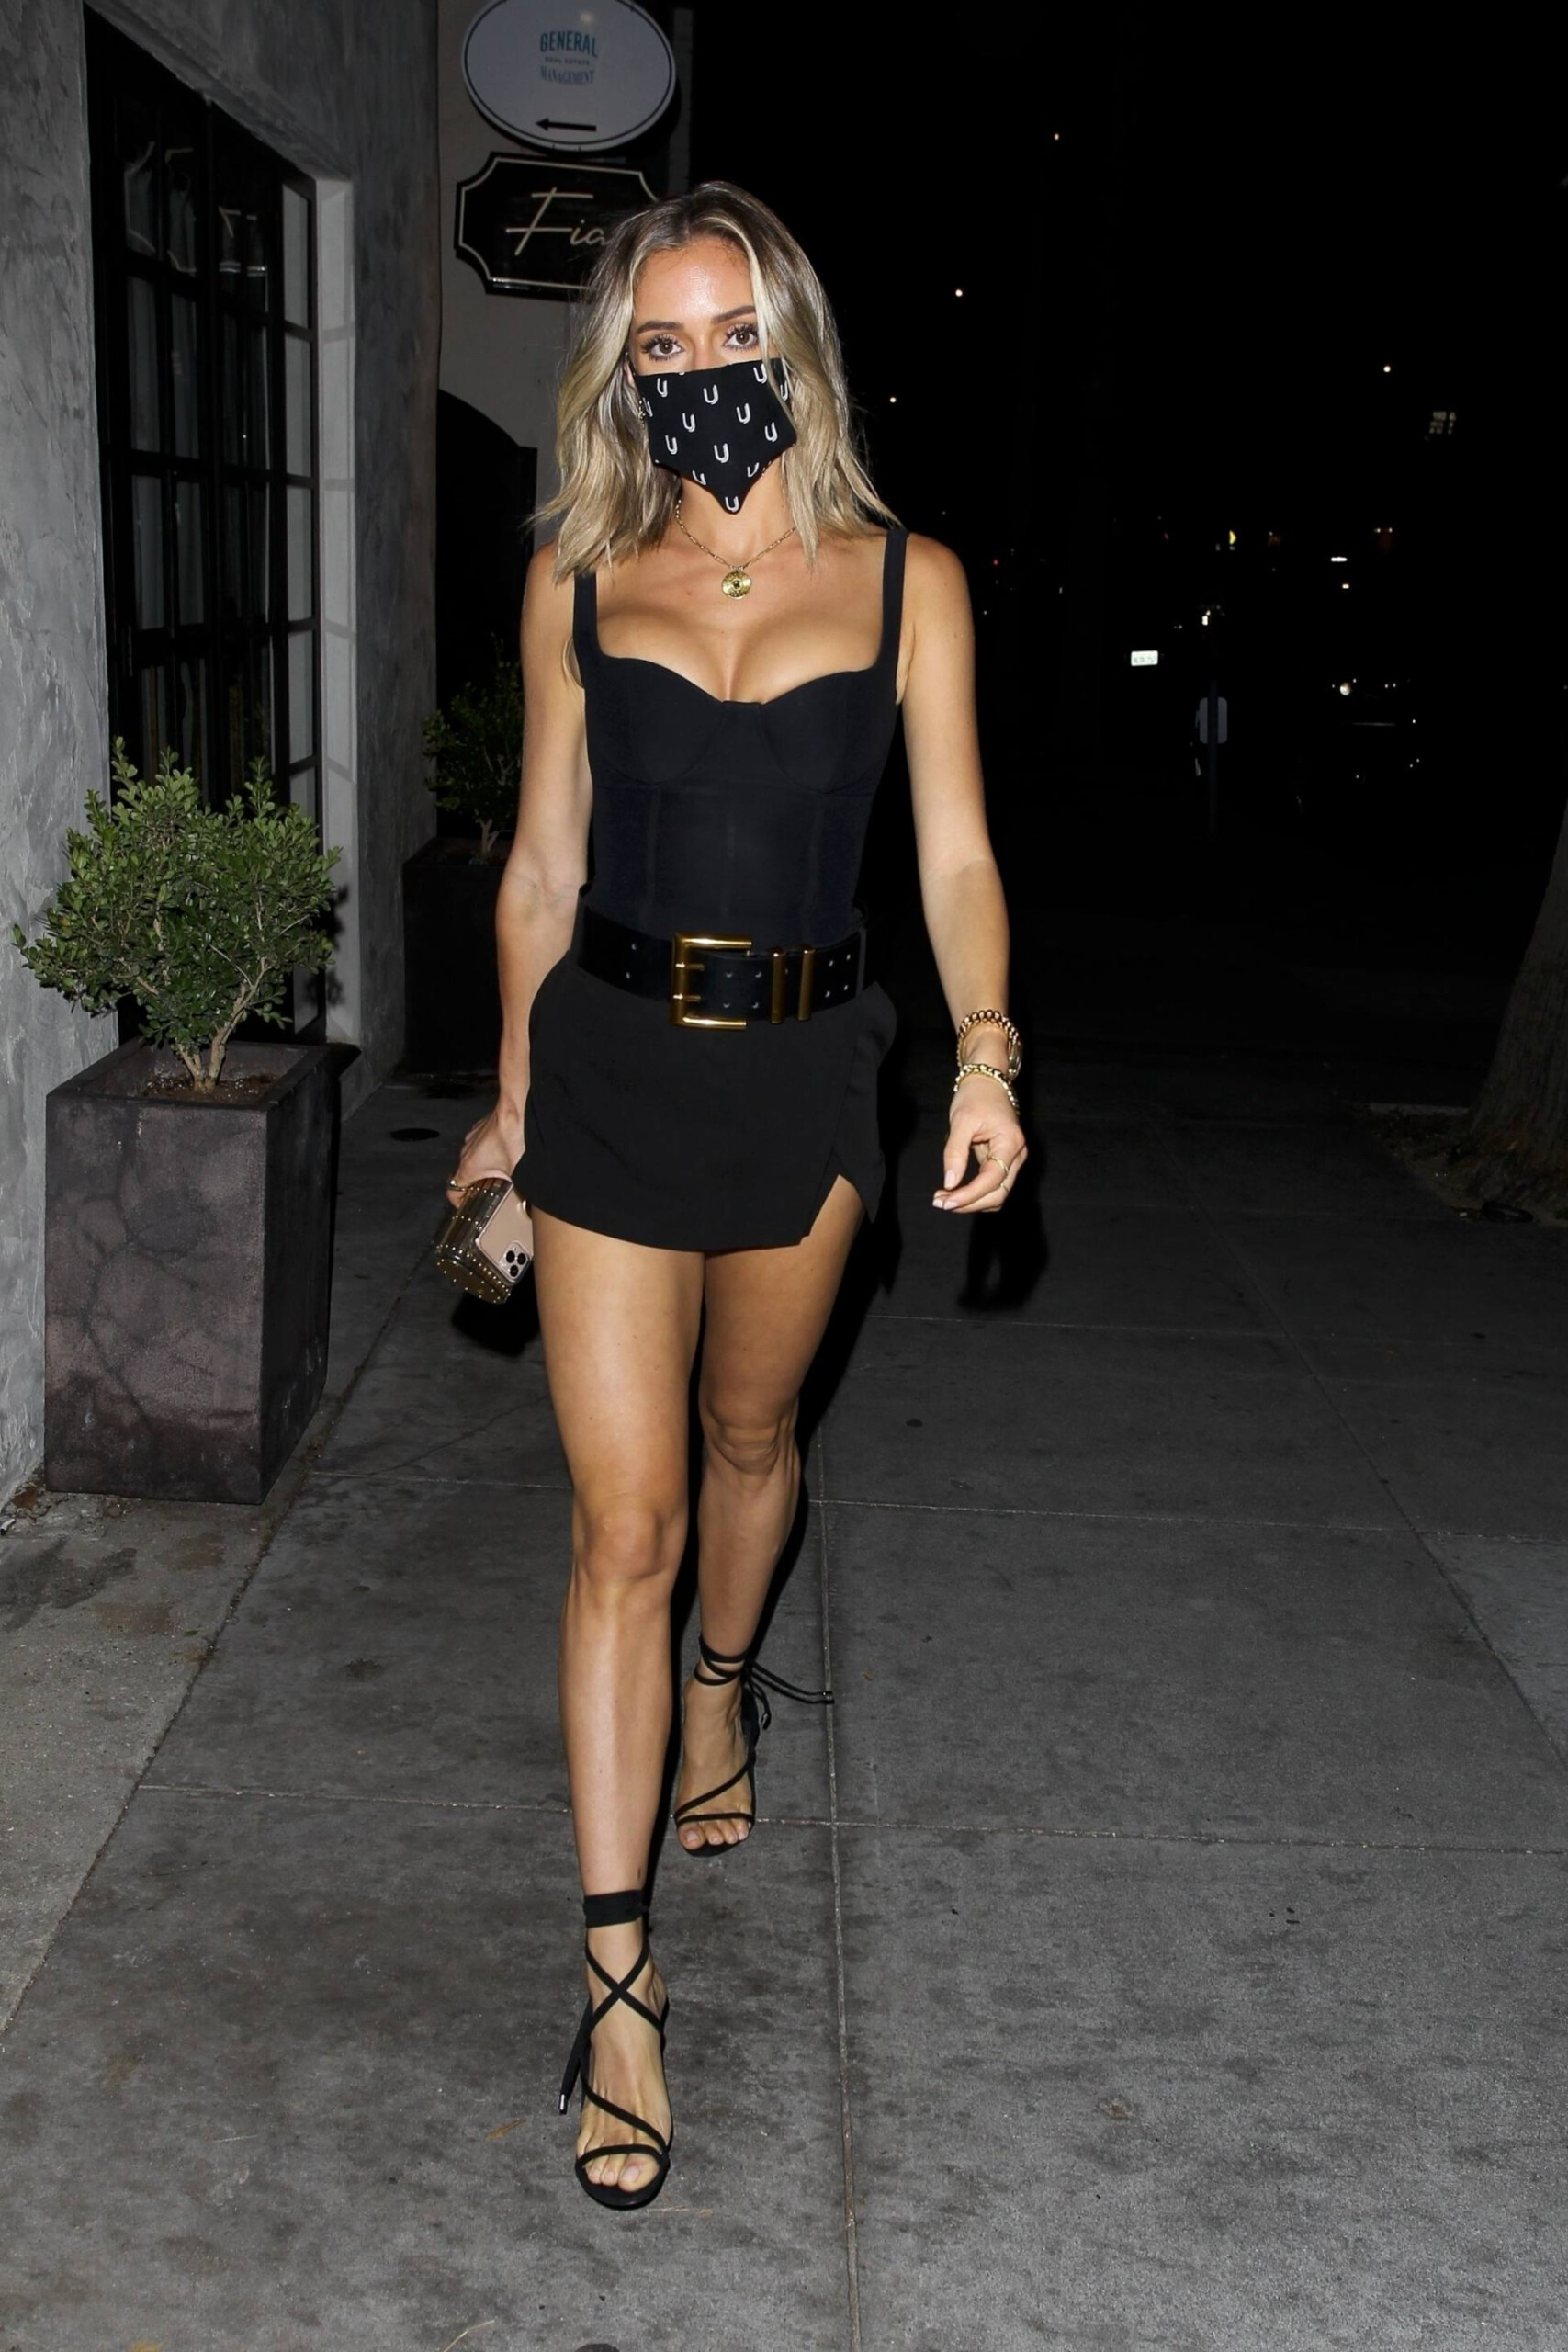 Kristin Cavallari – Sexy Legs And Beautiful Cleavage At Fia In Santa Monica 0016